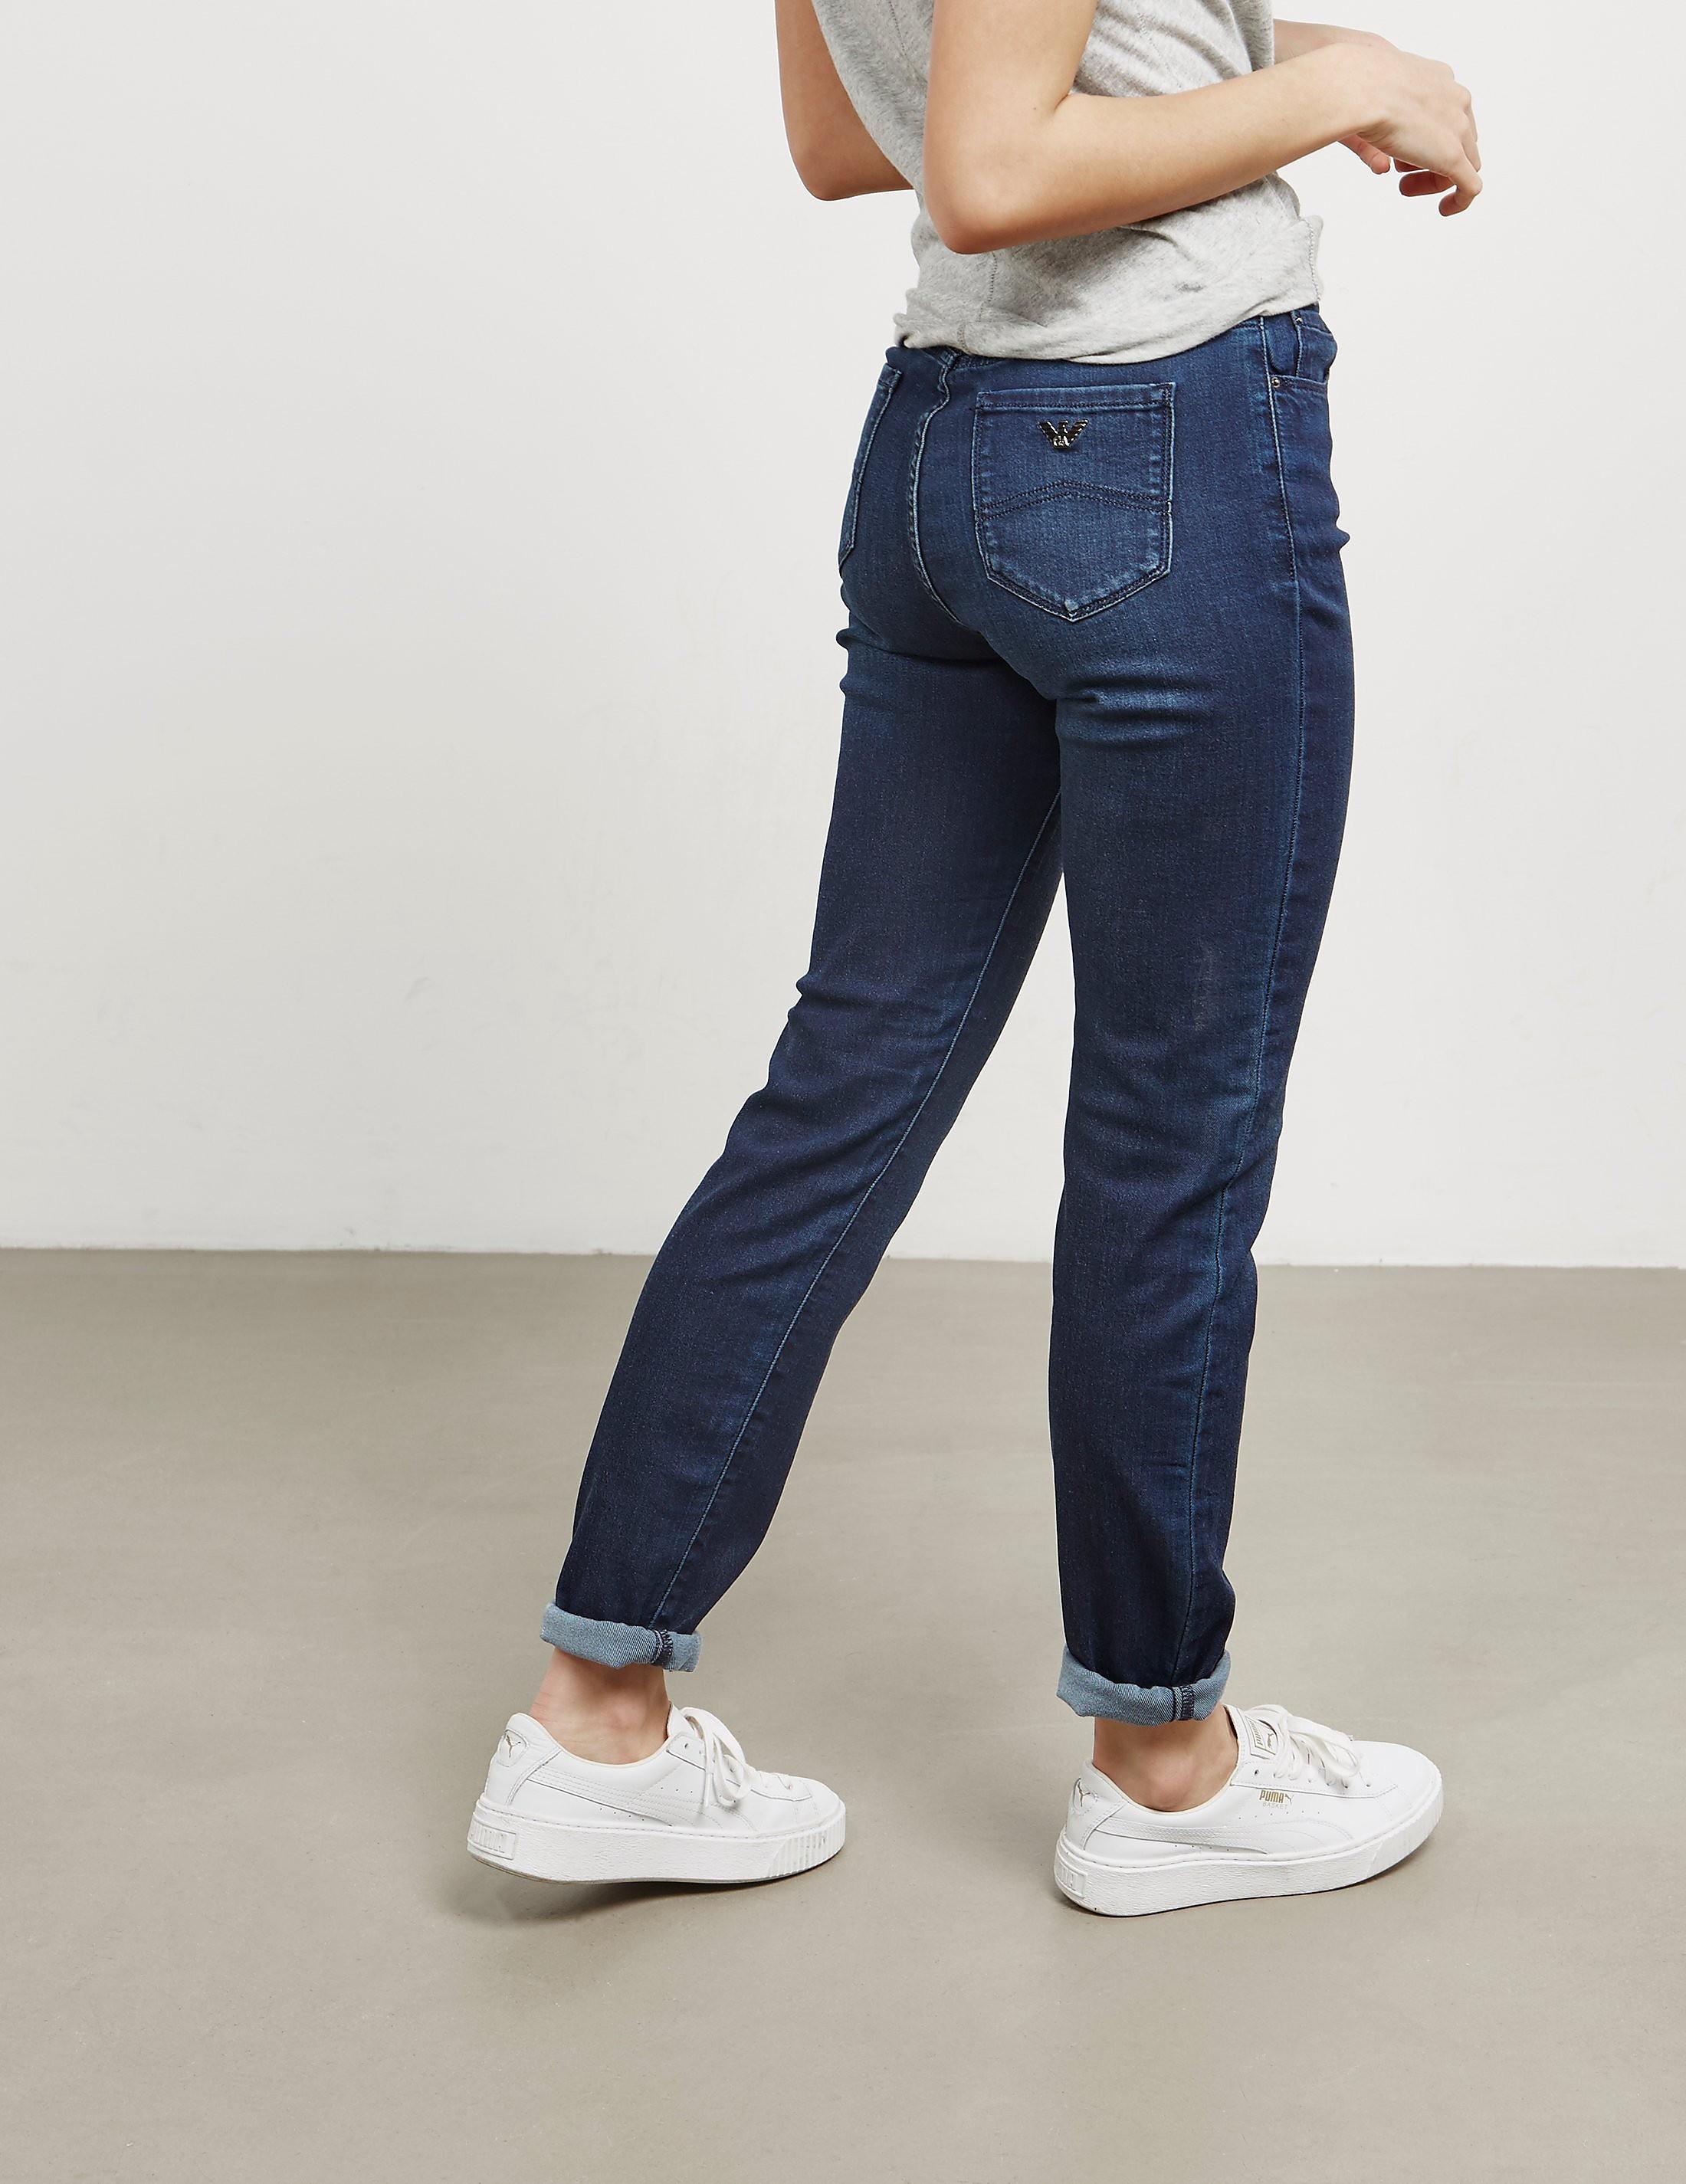 Emporio Armani 5 Pocket Jeans